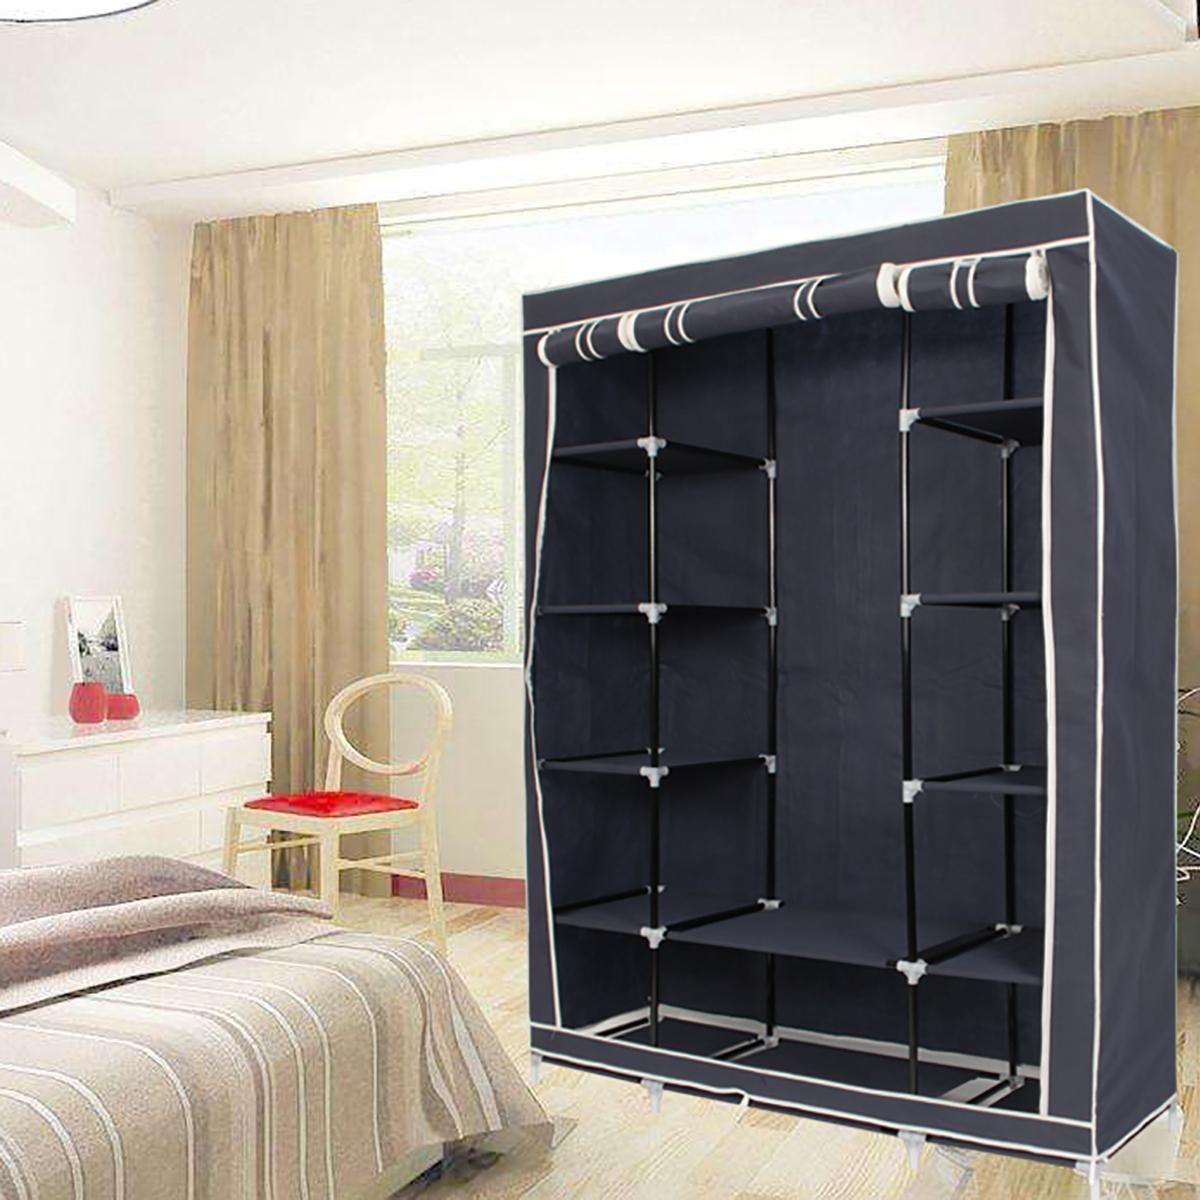 Generic Portable Closet Storage Organizers Wardrobe Clothes